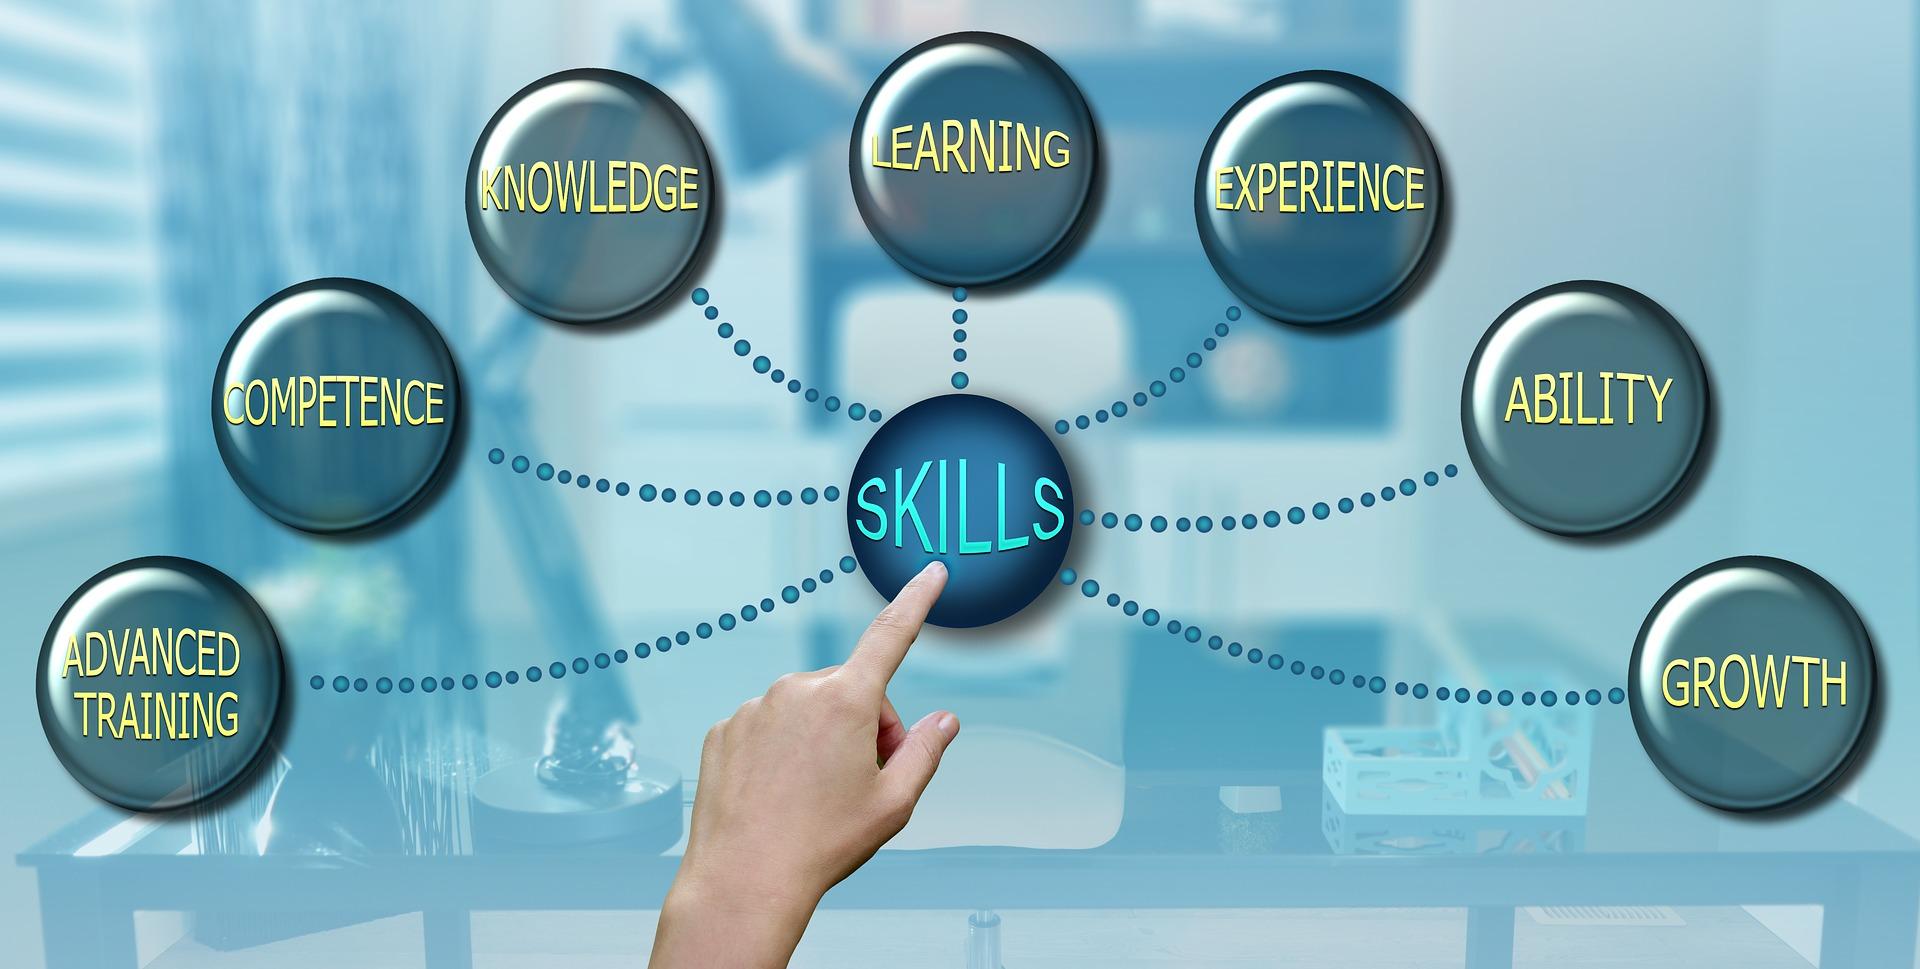 skills-3260624_1920